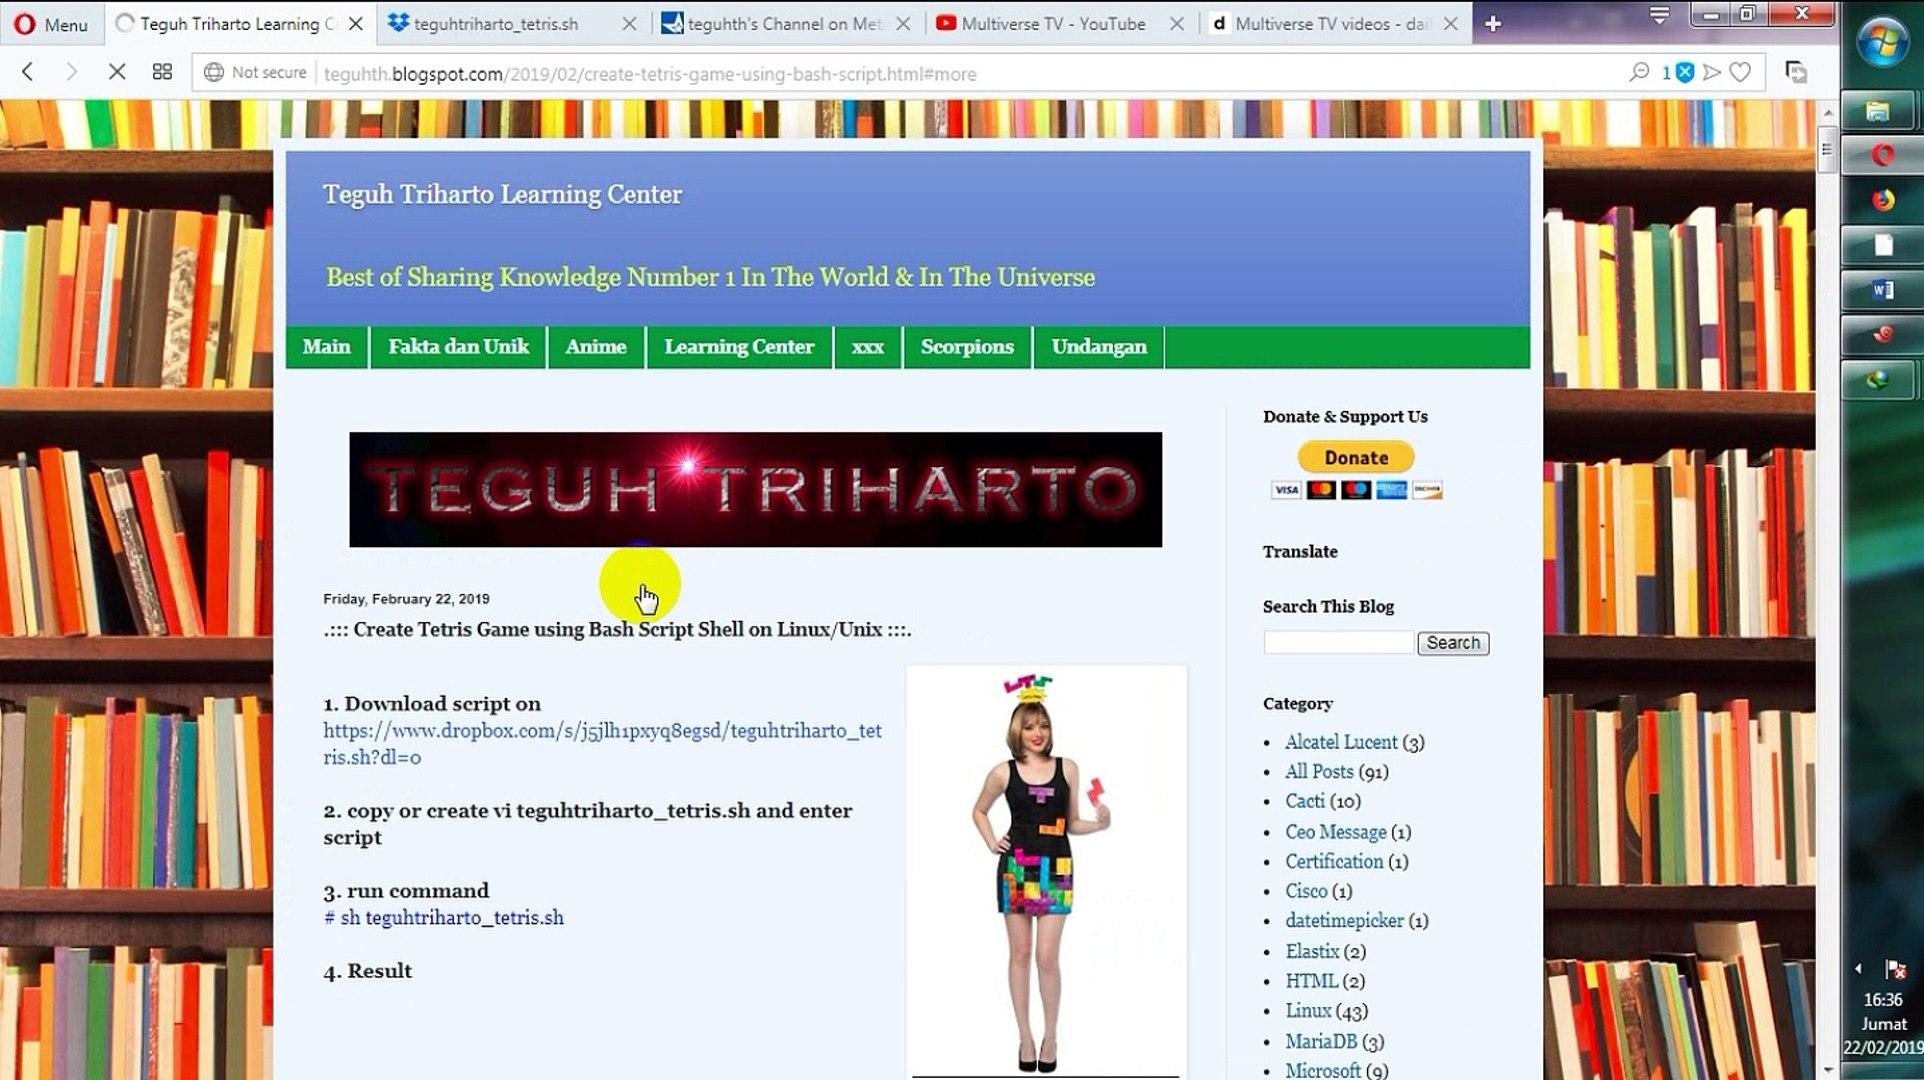 Create Tetris Game using Bash Script Shell on Linux/Unix next php